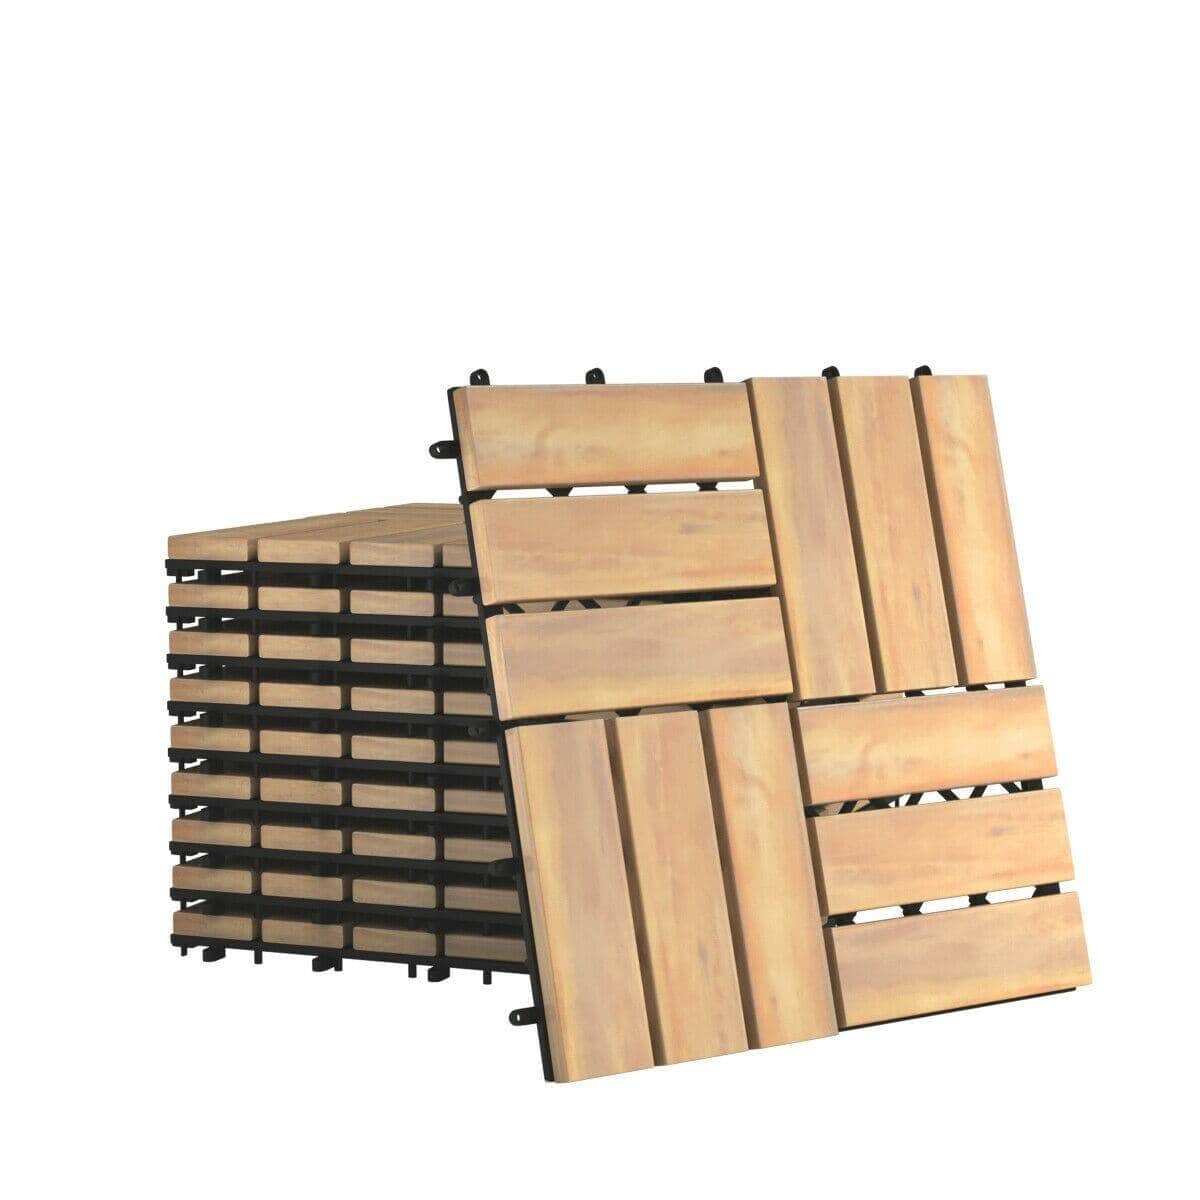 "10 PCS 12"" x 12"" Acacia Wood Interlocking Check Deck Tiles-$48.95 + Free Shipping"